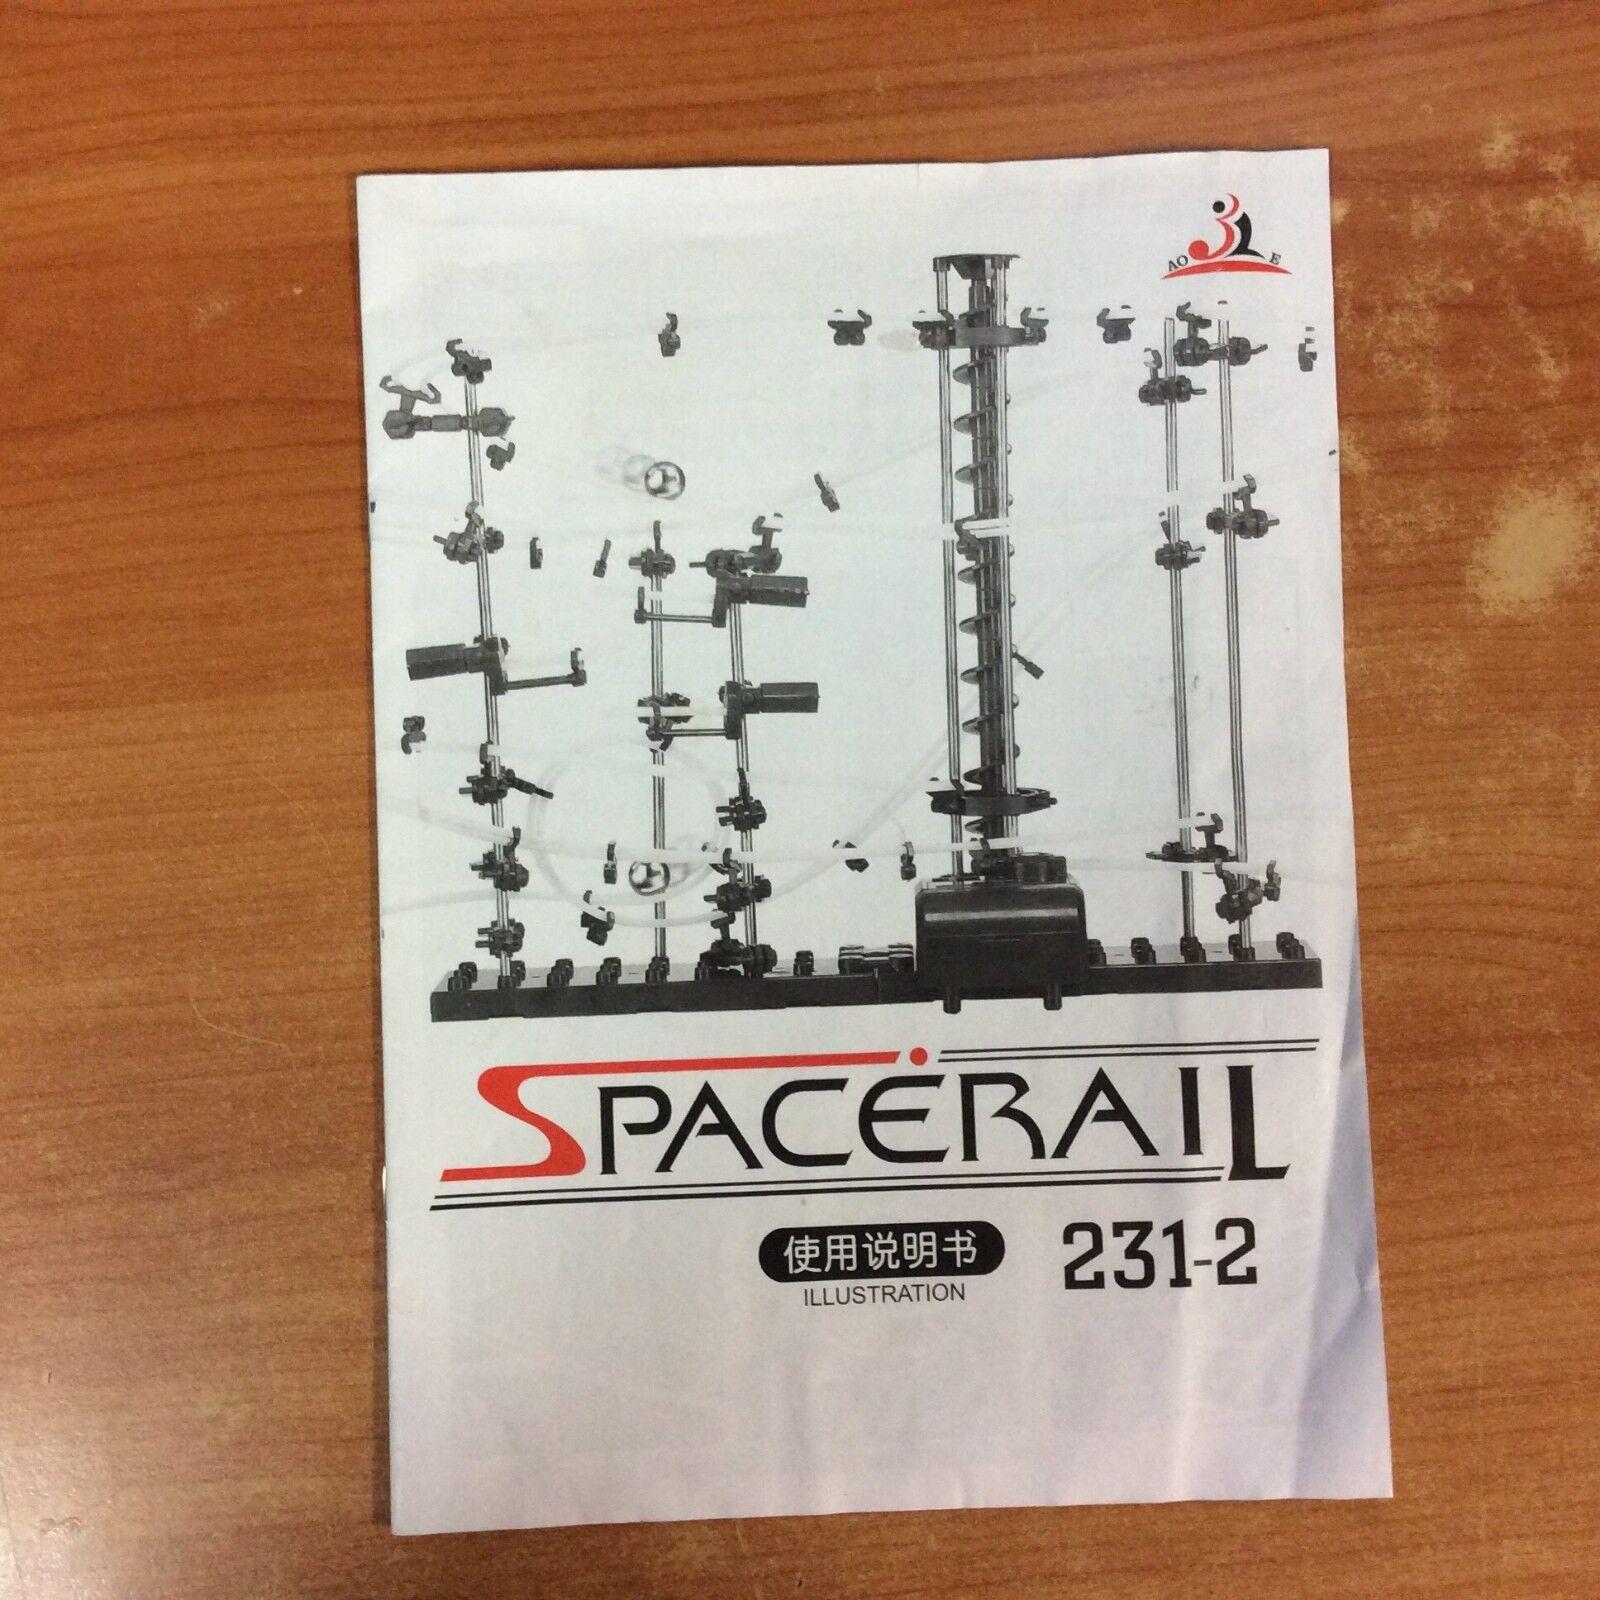 2-Level Space Rail Spiral Lift Roller Coaster Electric Assemble Assemble Assemble Model f3f699